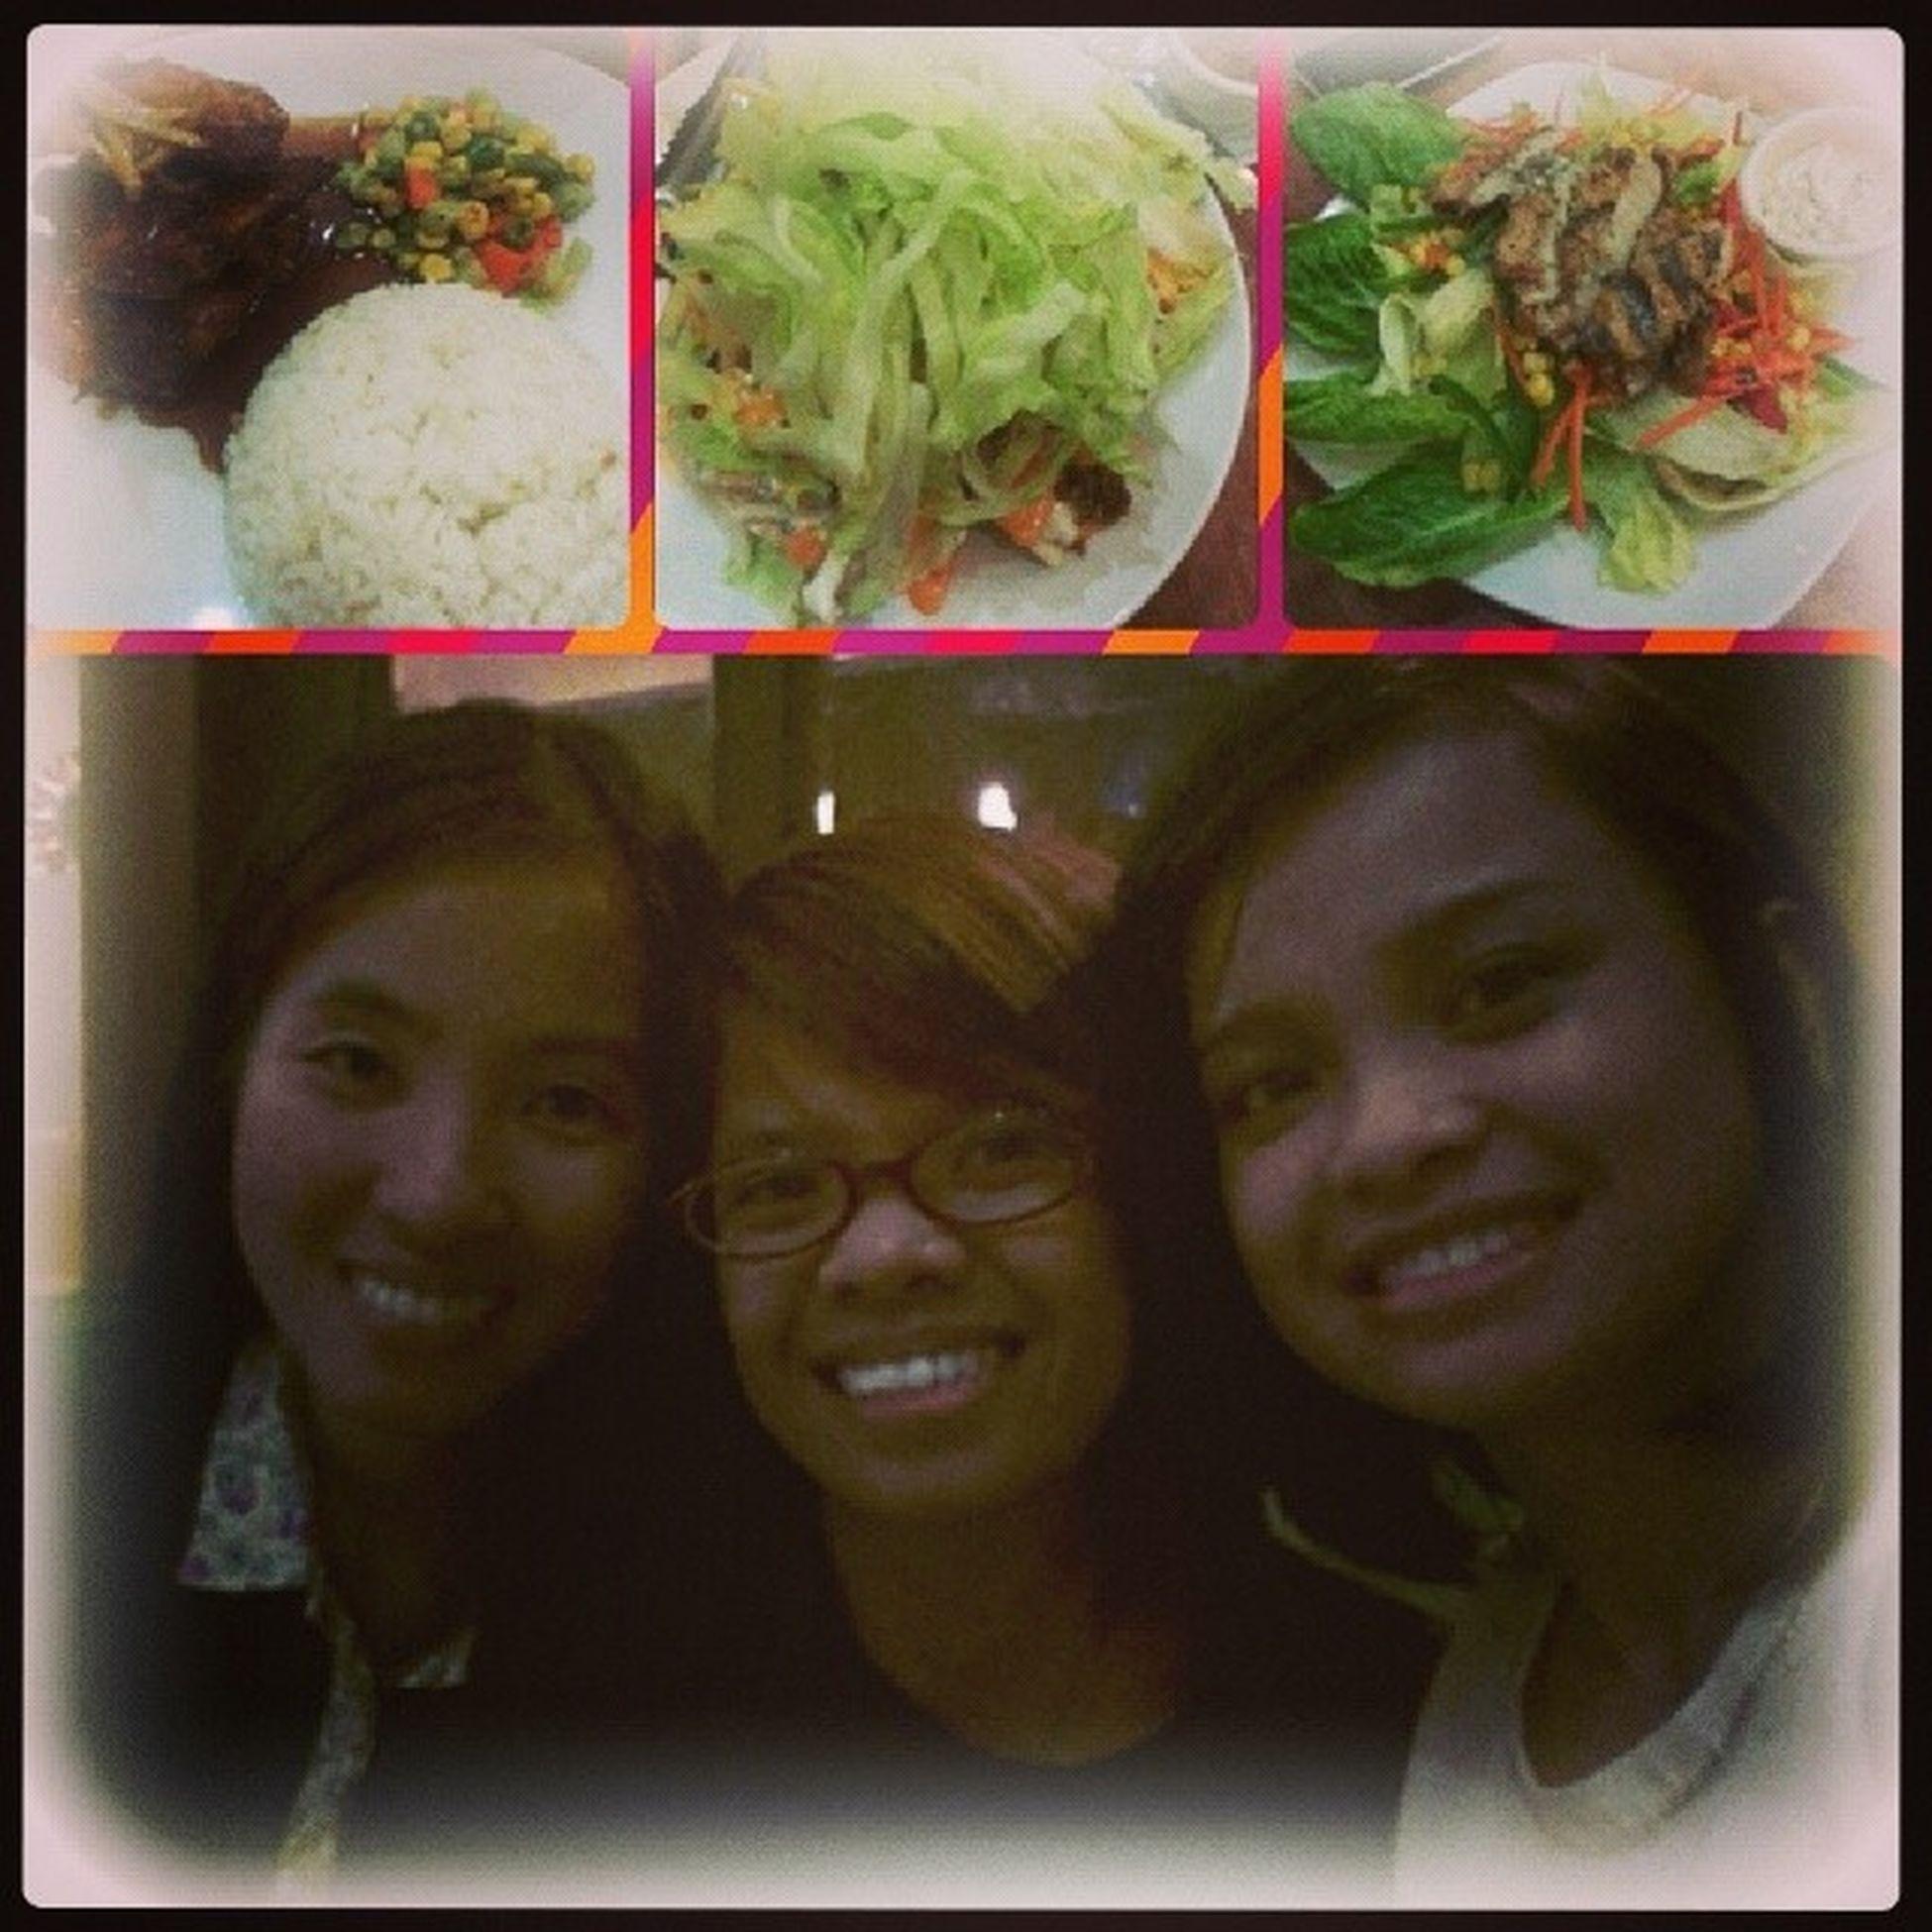 Dinner with BFF! Thank you girls.. Loveyou both! 😄😊😃☺😍😘😘 Bday Dinner 04242014 @joyce_dg Tacosalad honeyglazedchknwings grilledchicken